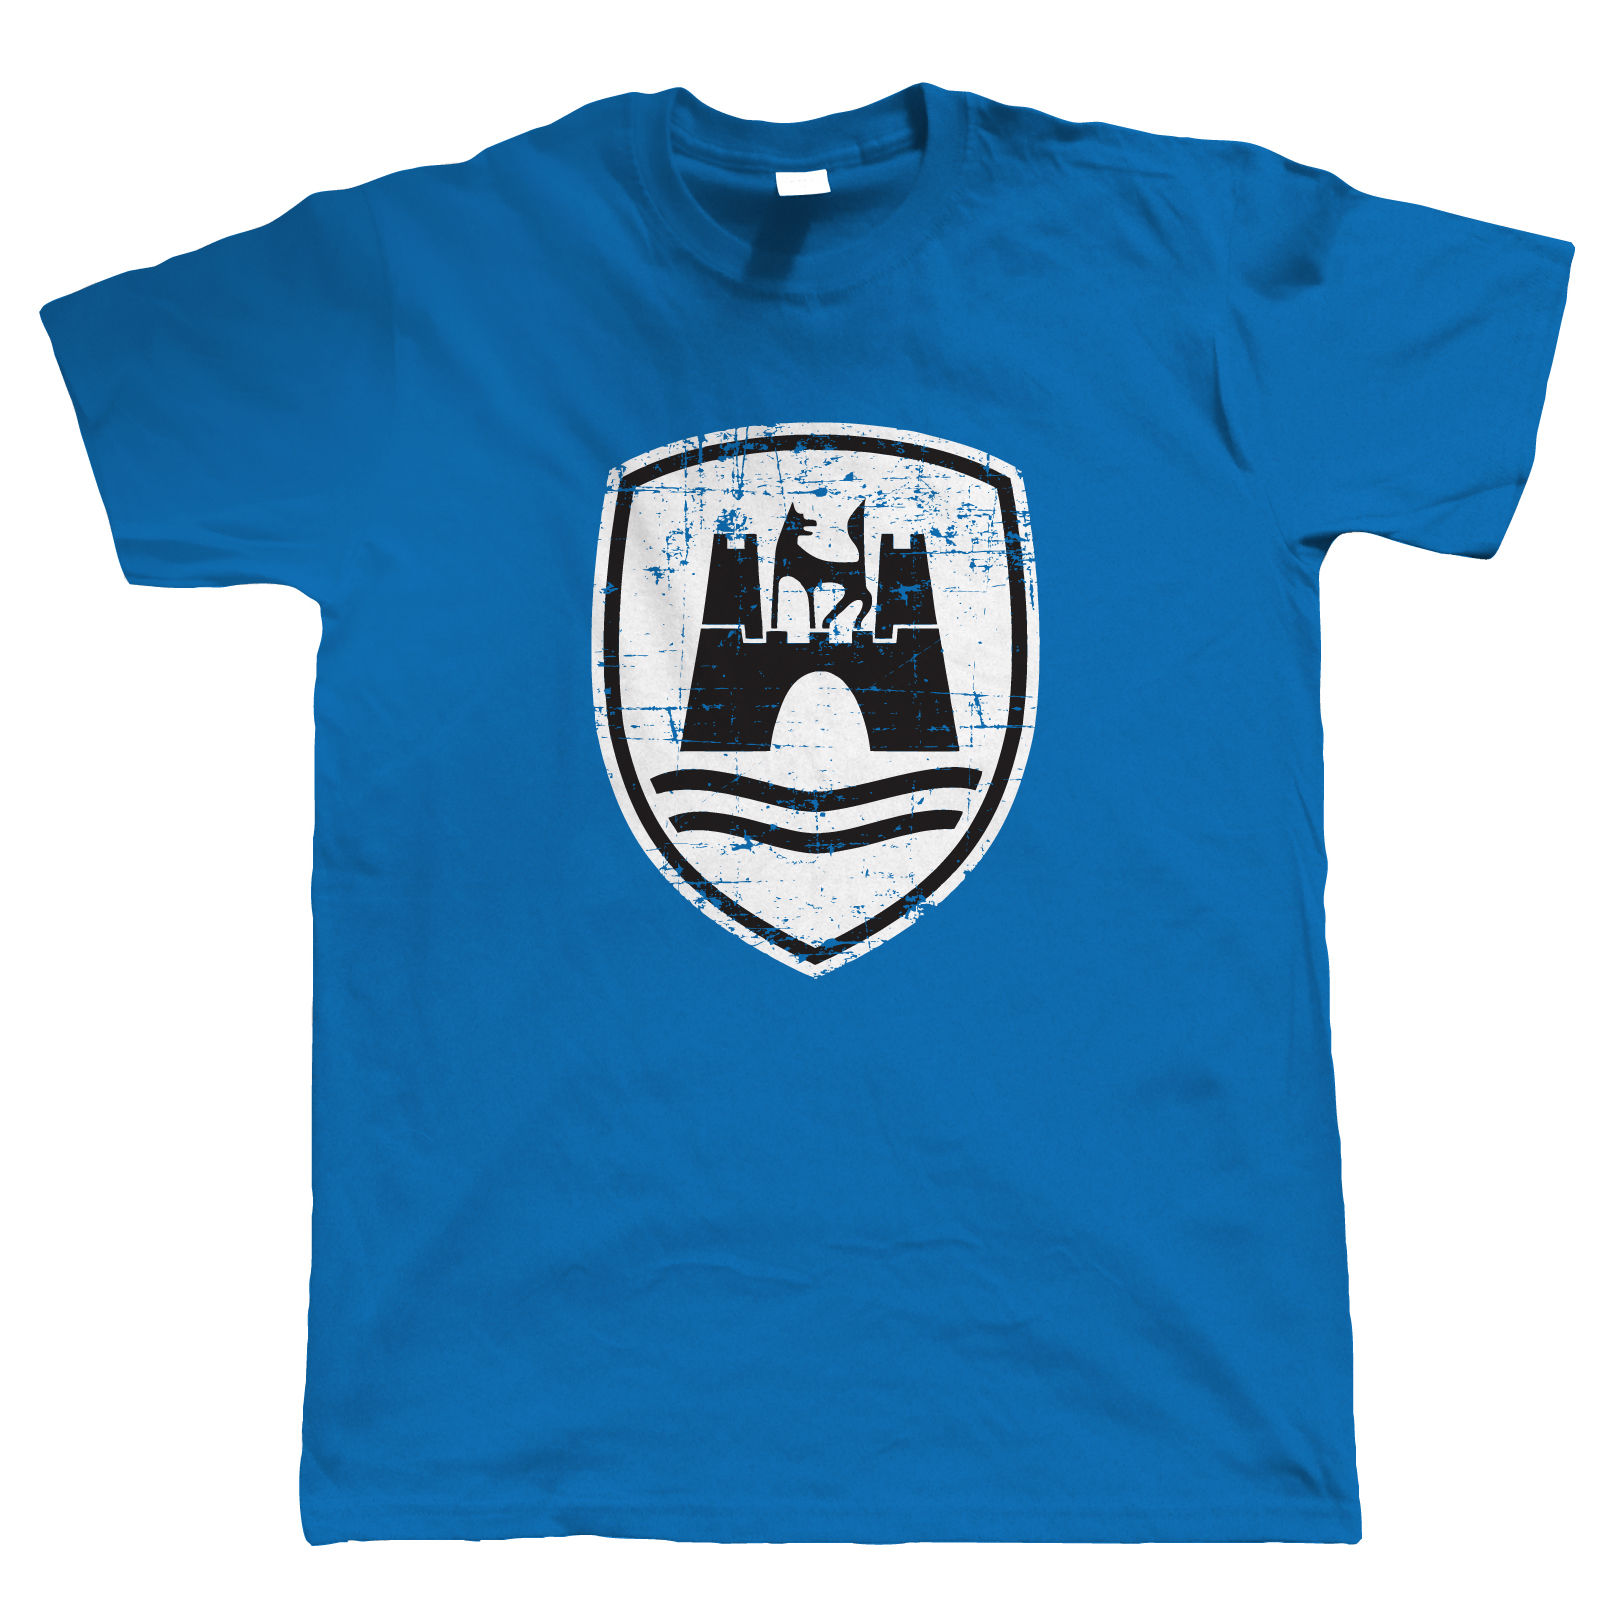 Classico Di Wolfsburg, Uomo Campervan T-shirt Cotton T-Shirt Fashion T Shirt Free Shipping Animal Loose Clothes